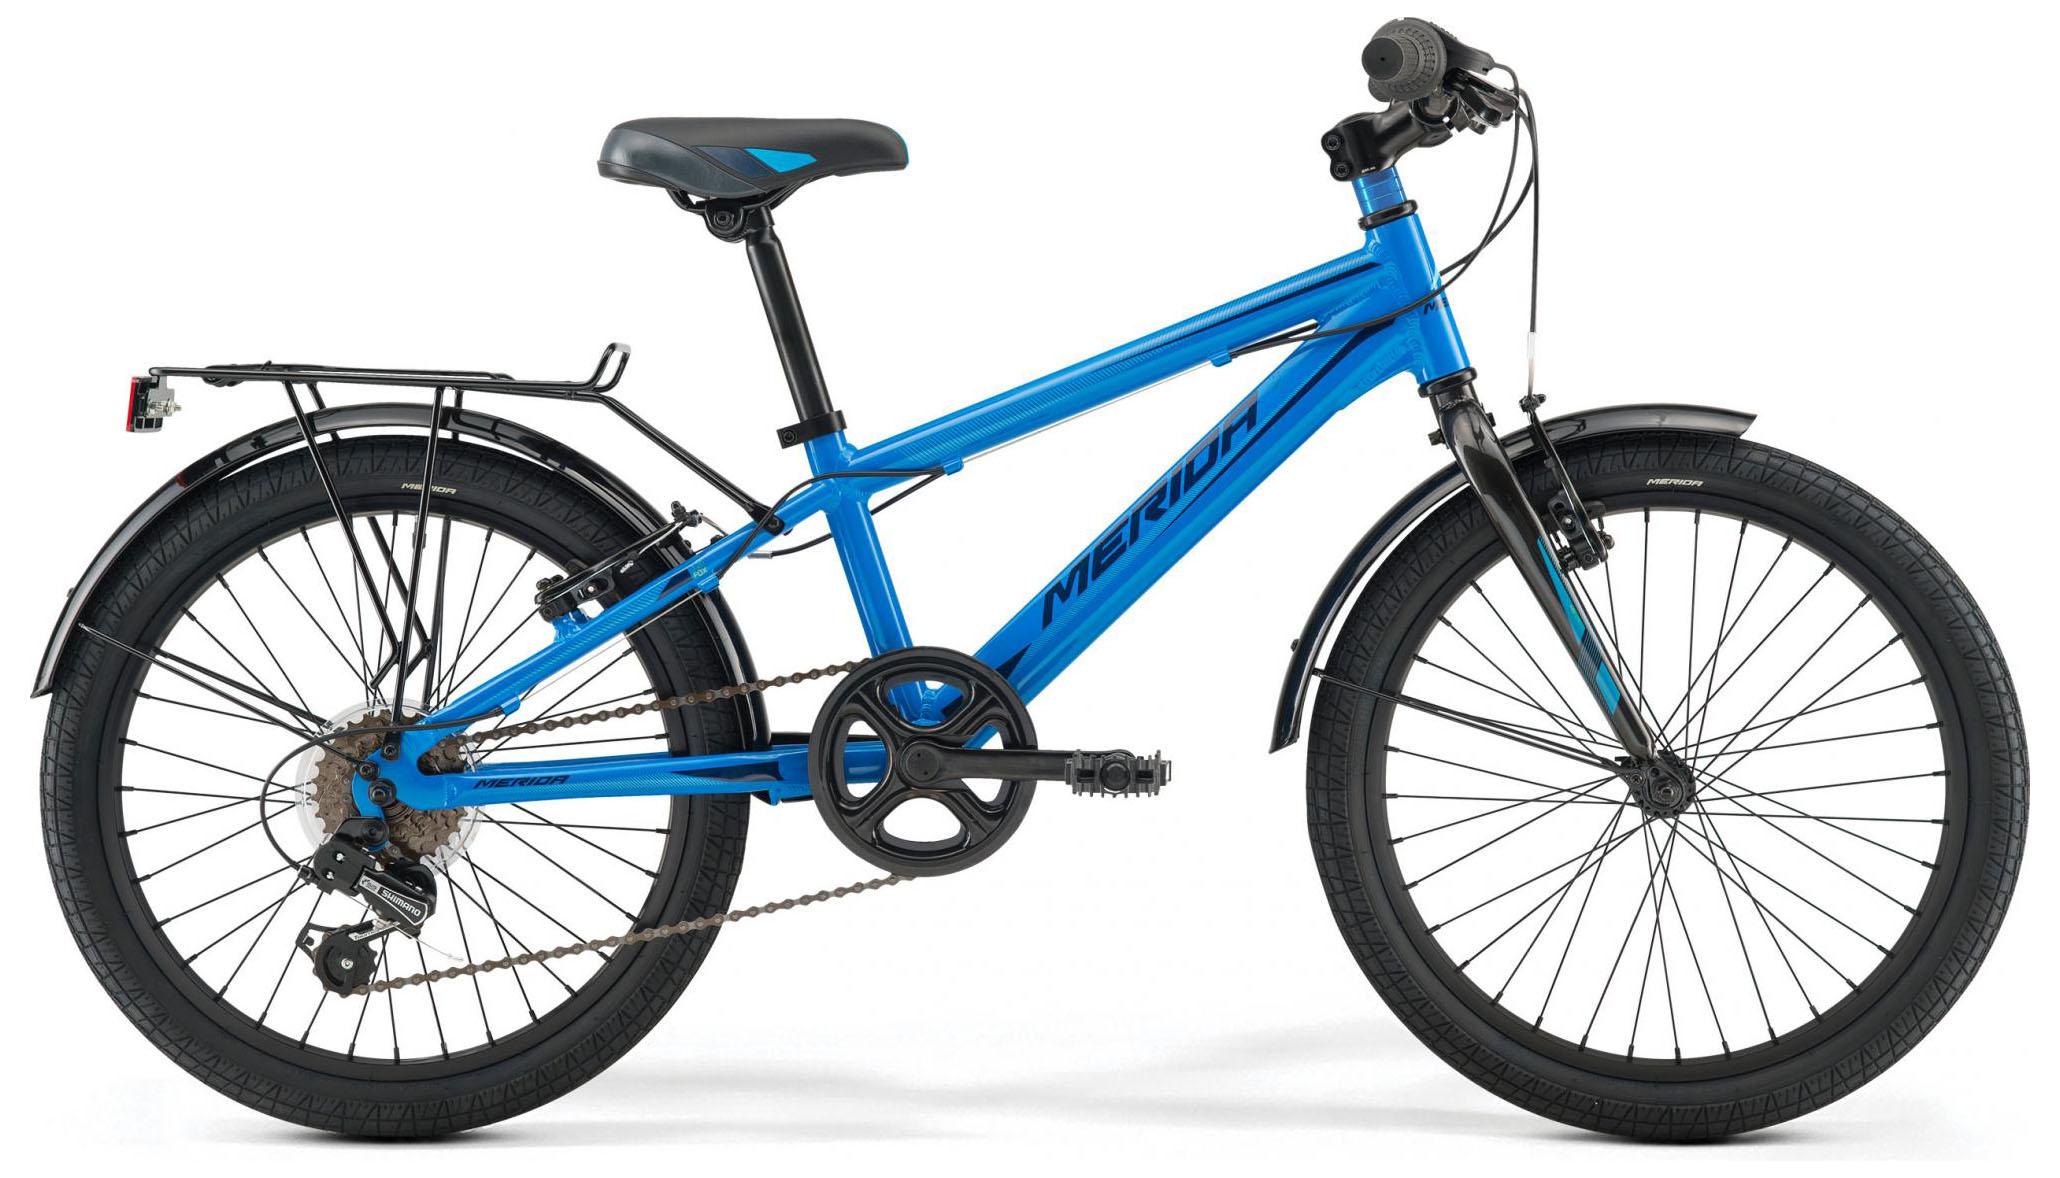 Велосипед Merida Fox J20 2019 детский велосипед merida chica j20 6spd 2016